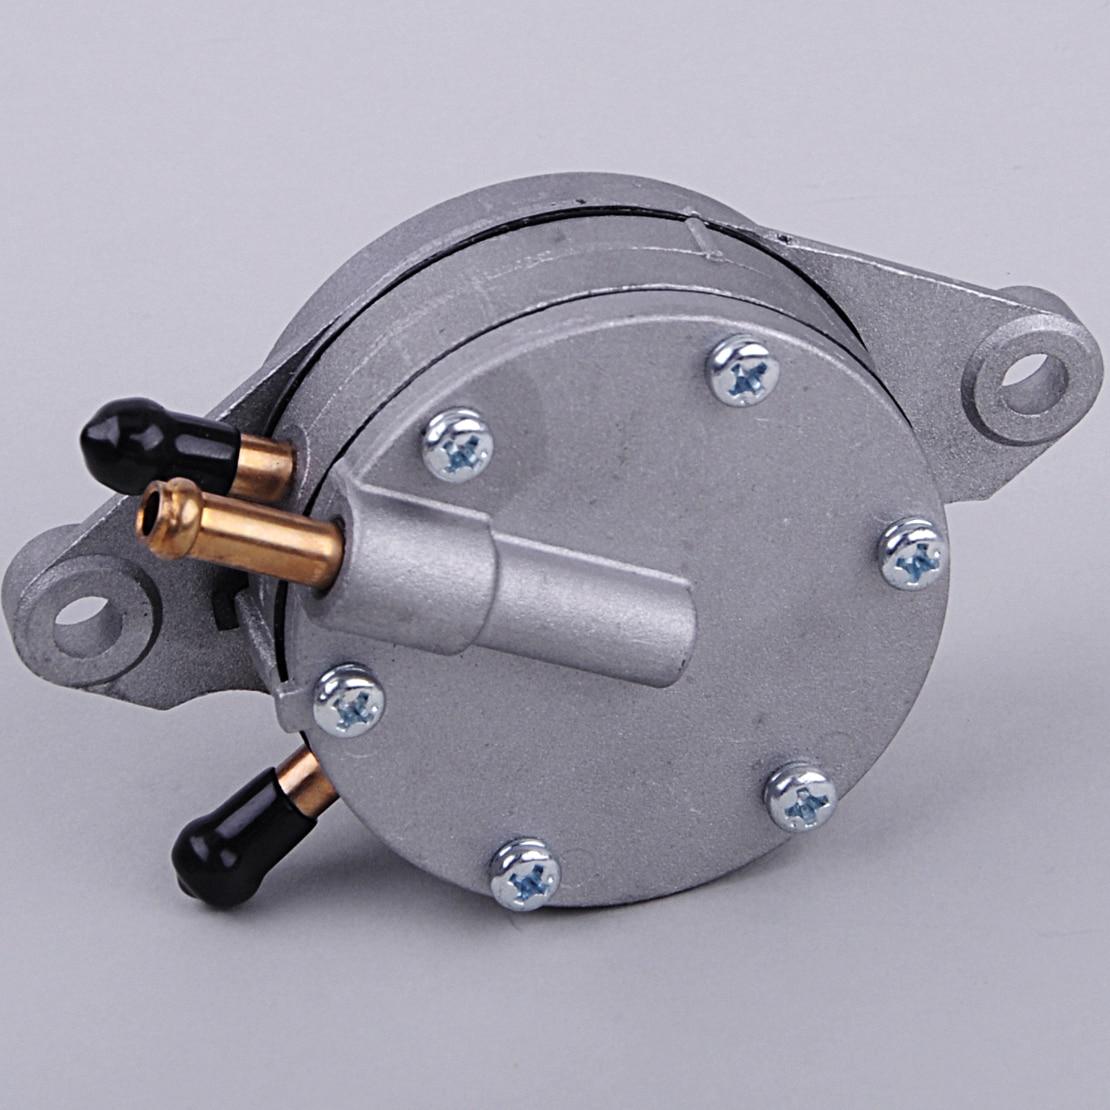 CITALL Motorcycle Fuel Pump J38-24452-10-00 J38244521000 Fit for Yamaha Gas Golf Cart G2 G9 G11 G14